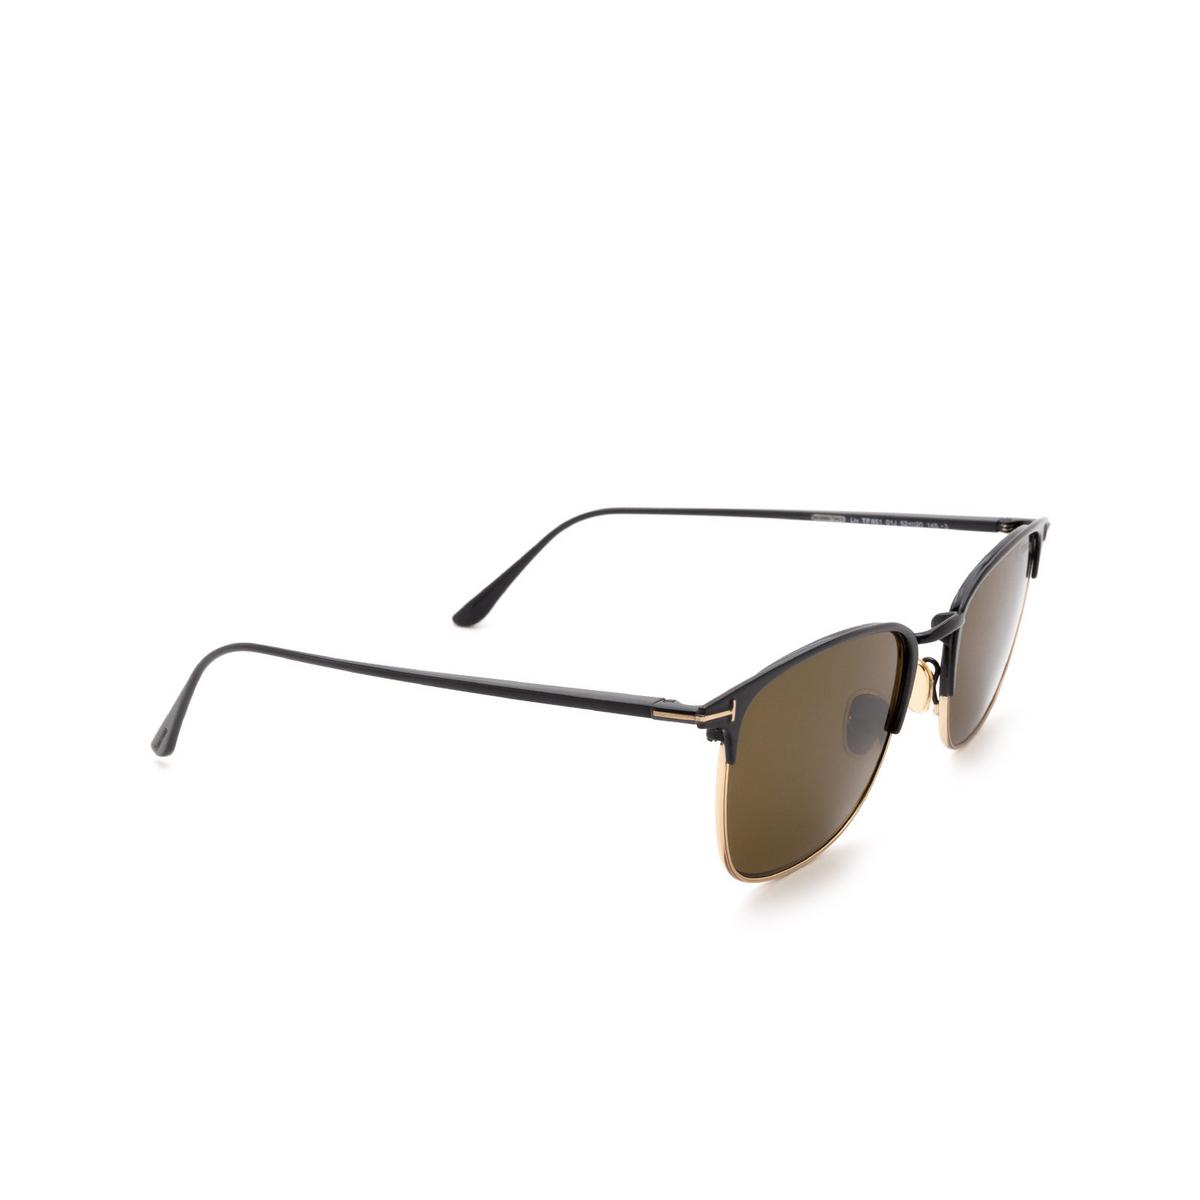 Tom Ford® Square Sunglasses: Liv FT0851 color Black 01J - three-quarters view.